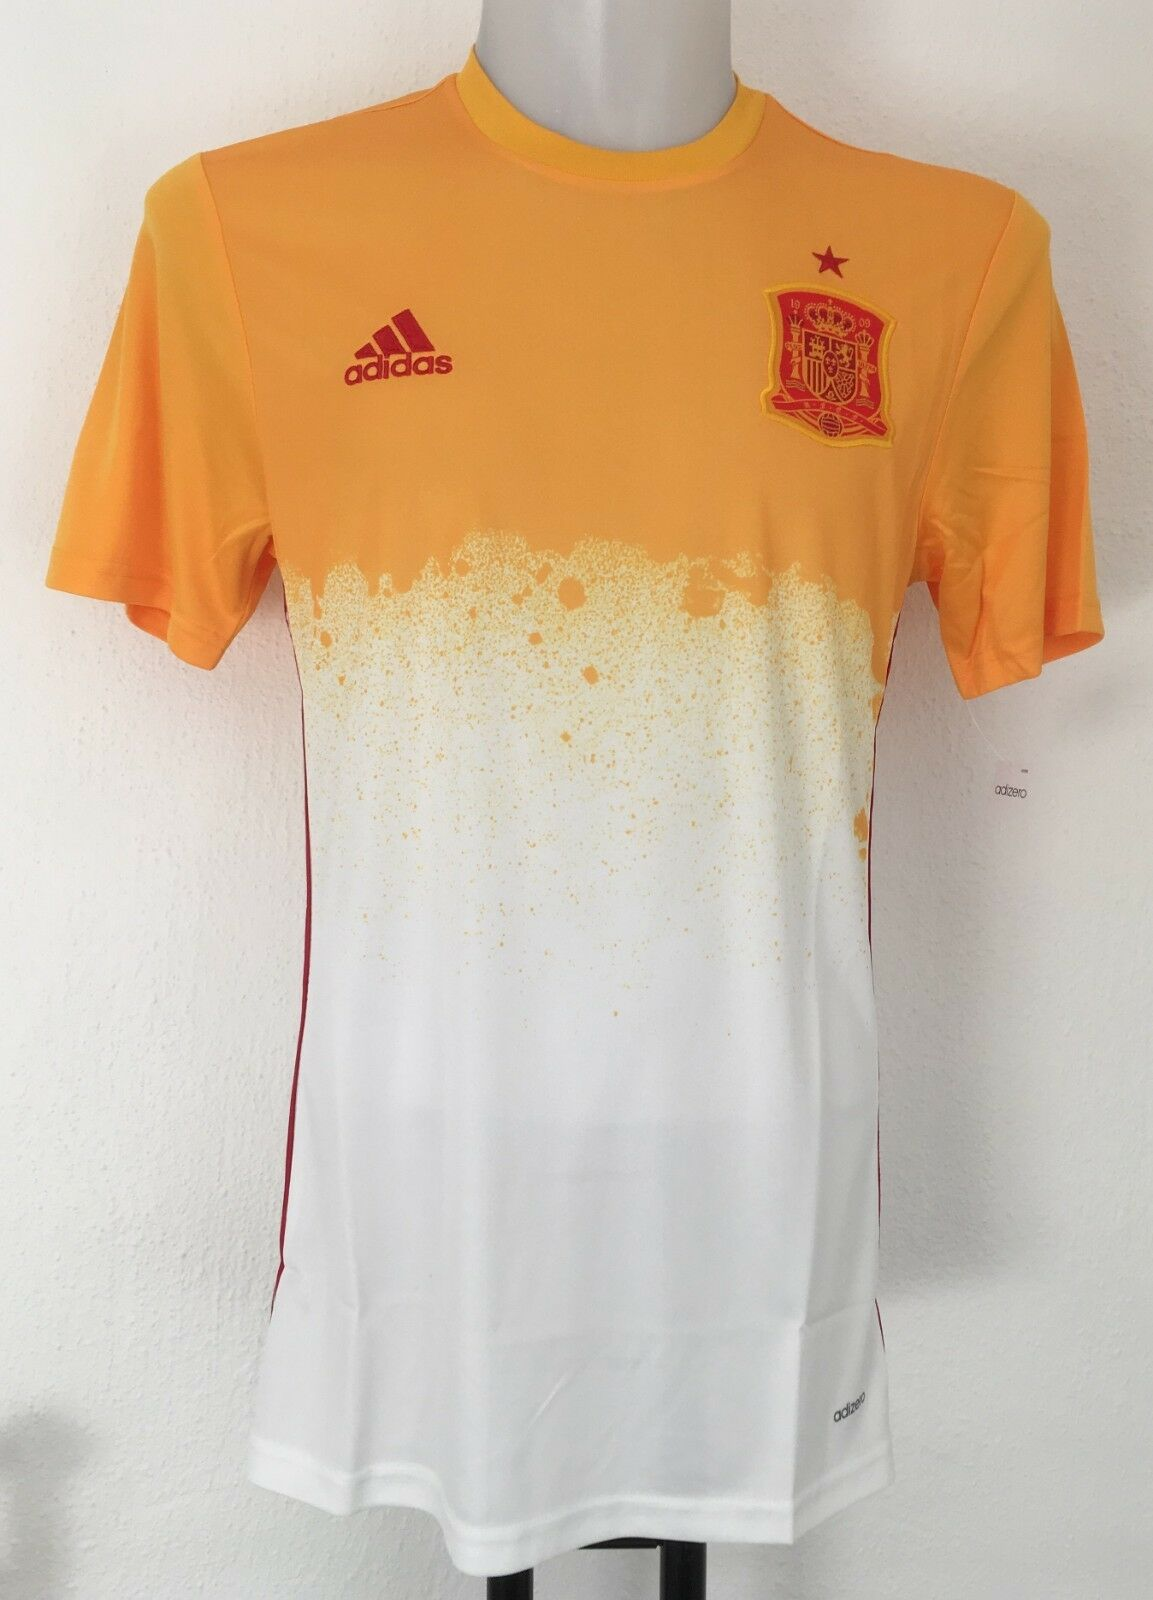 SPAIN FOOTBALL 2016 S S AWAY PRE-MATCH SHIRT BY ADIDAS SIZE MEN'S MEDIUM NEW